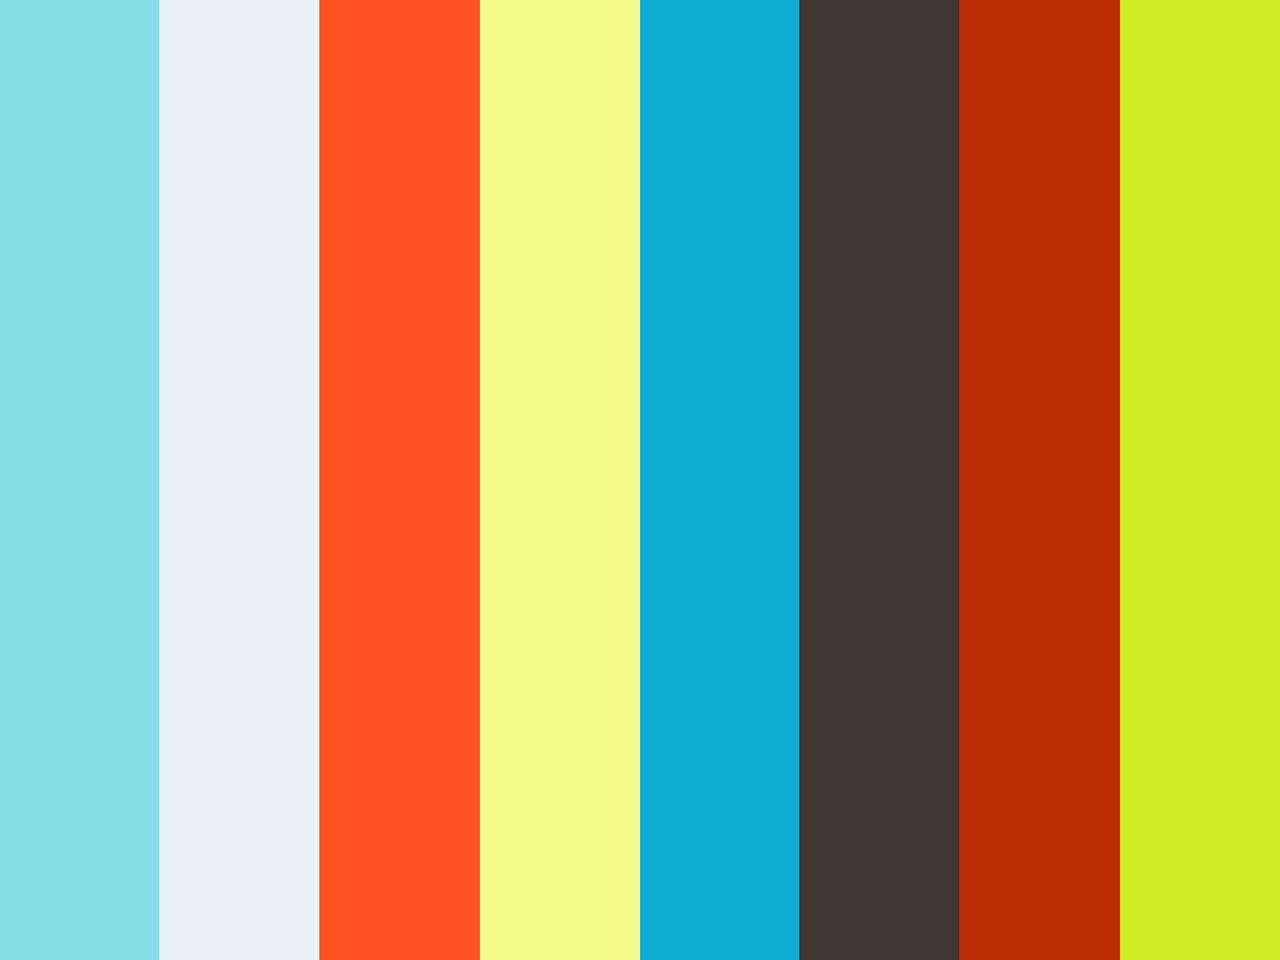 Monochrome Visuals 4K Pack